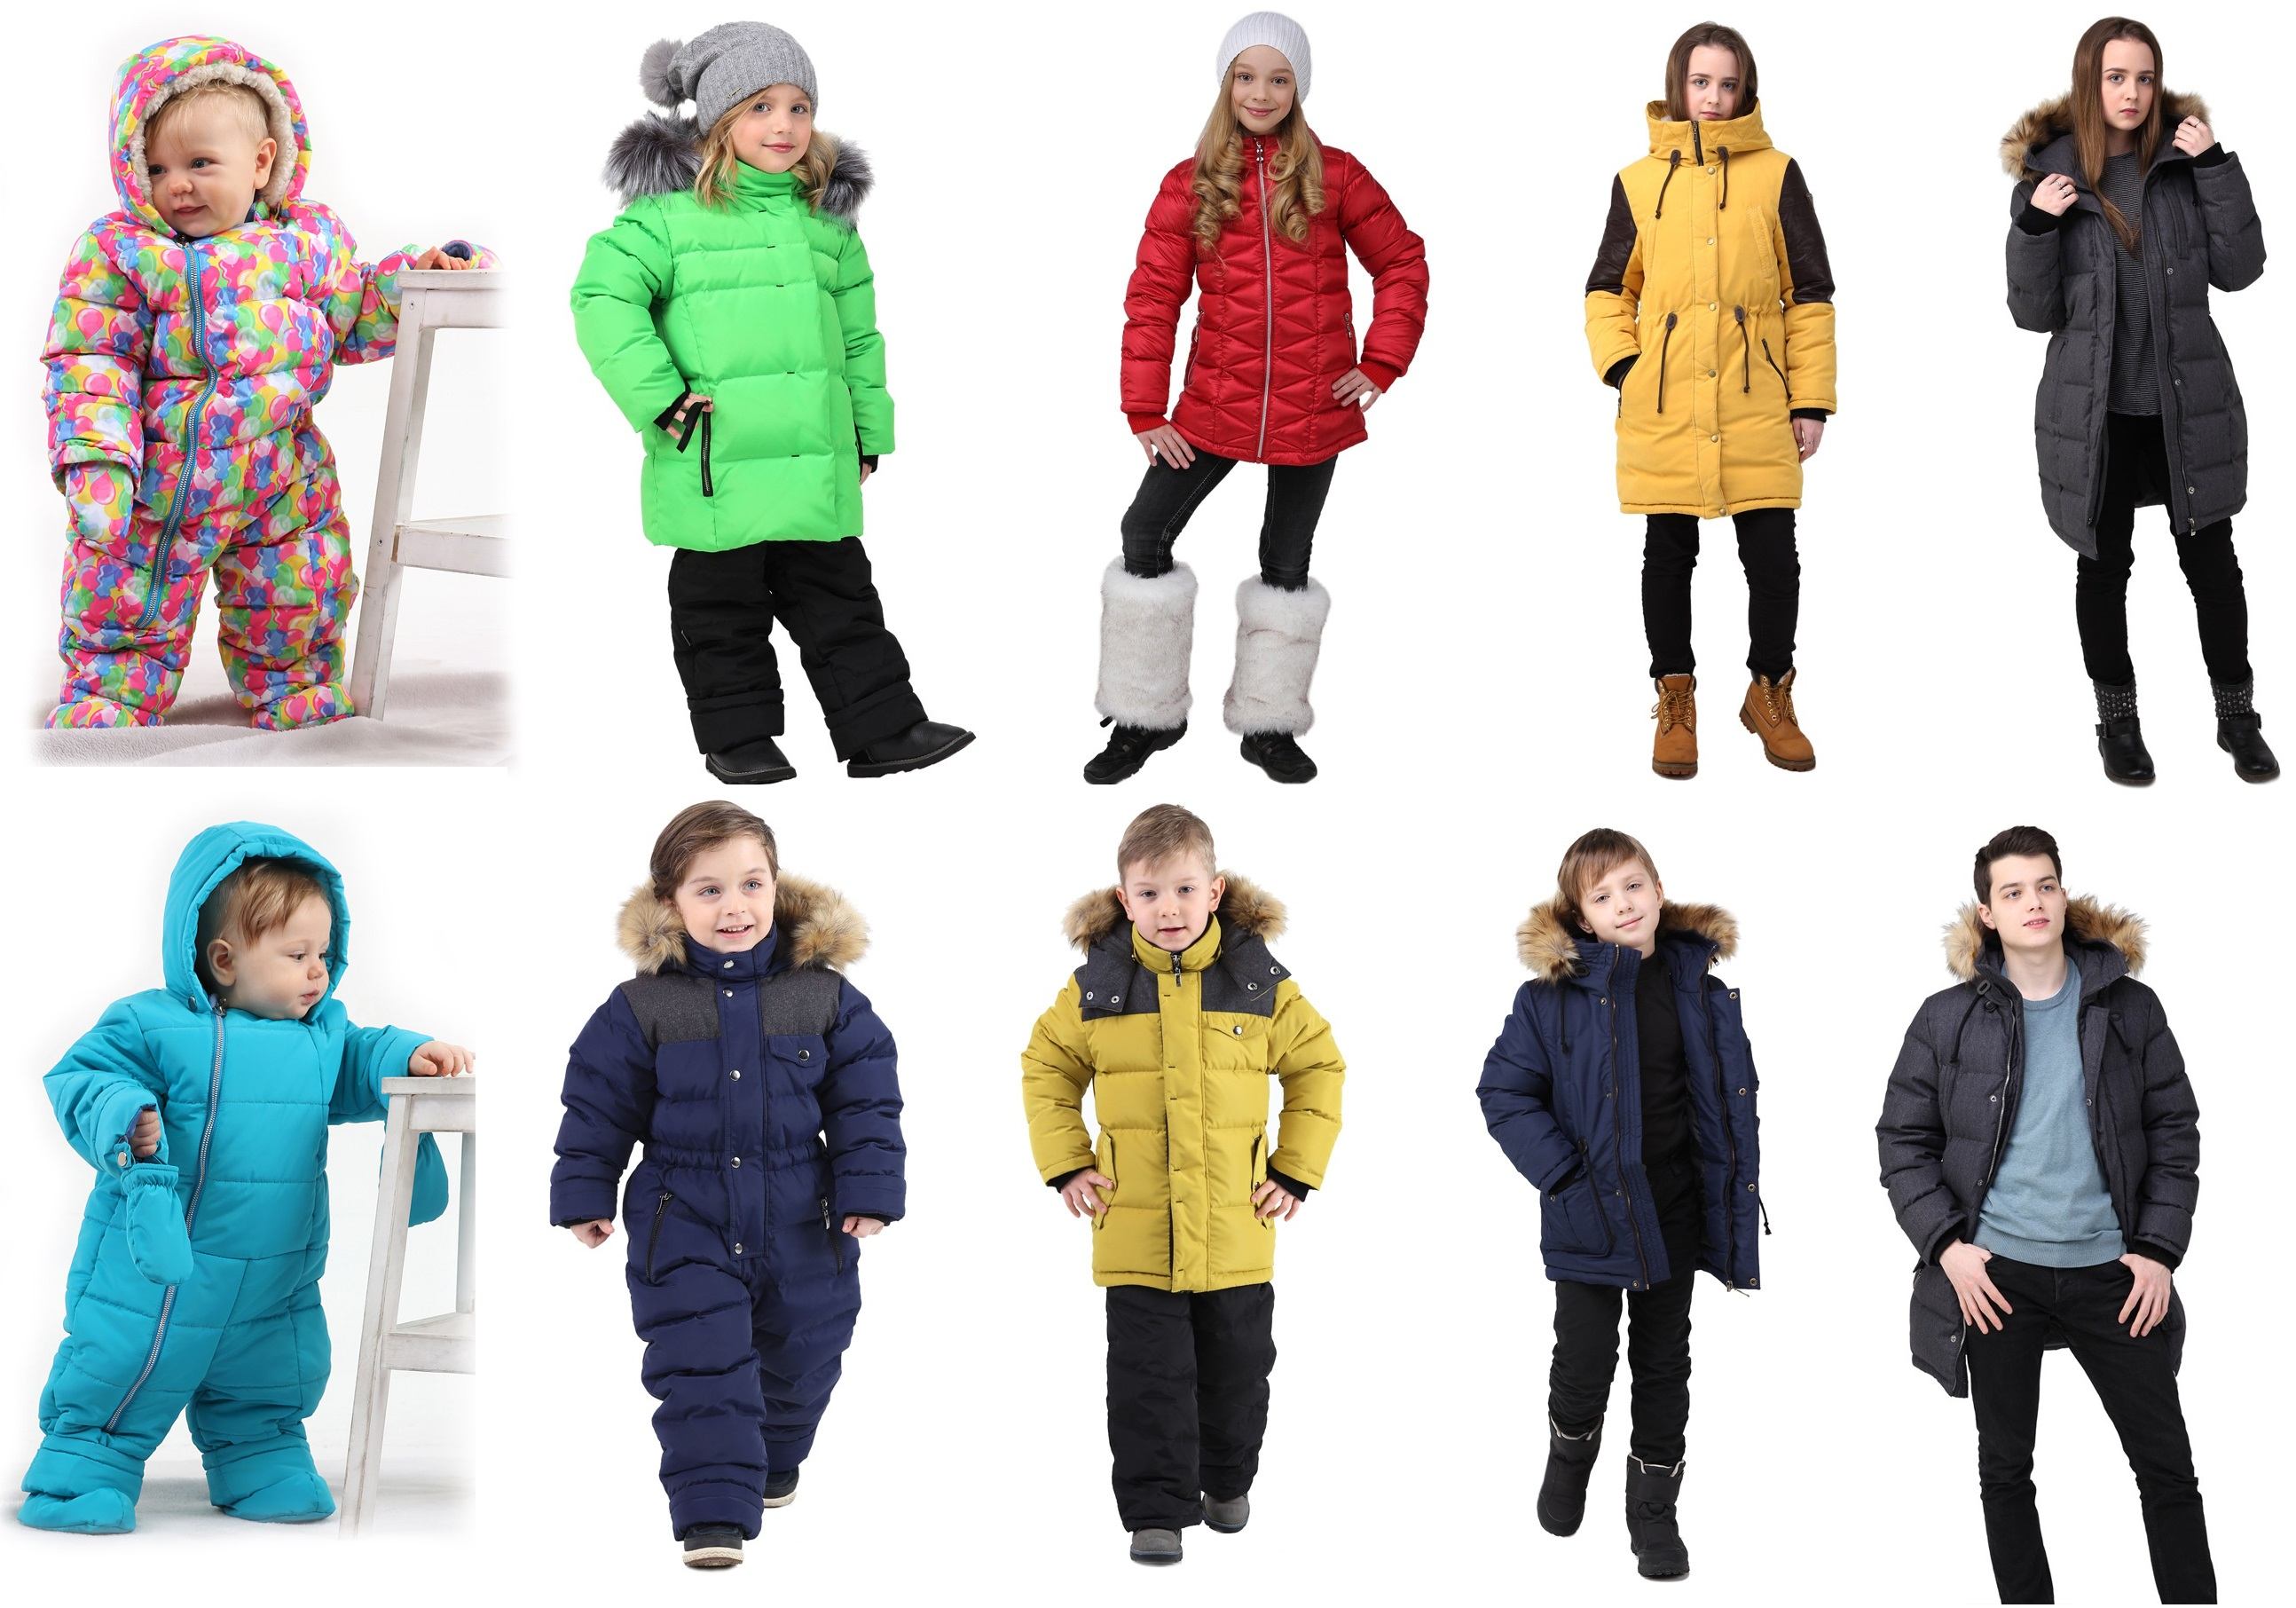 Тalvi - модно, классно, тепло и безопасно - 31. Распродажа! Без рядов